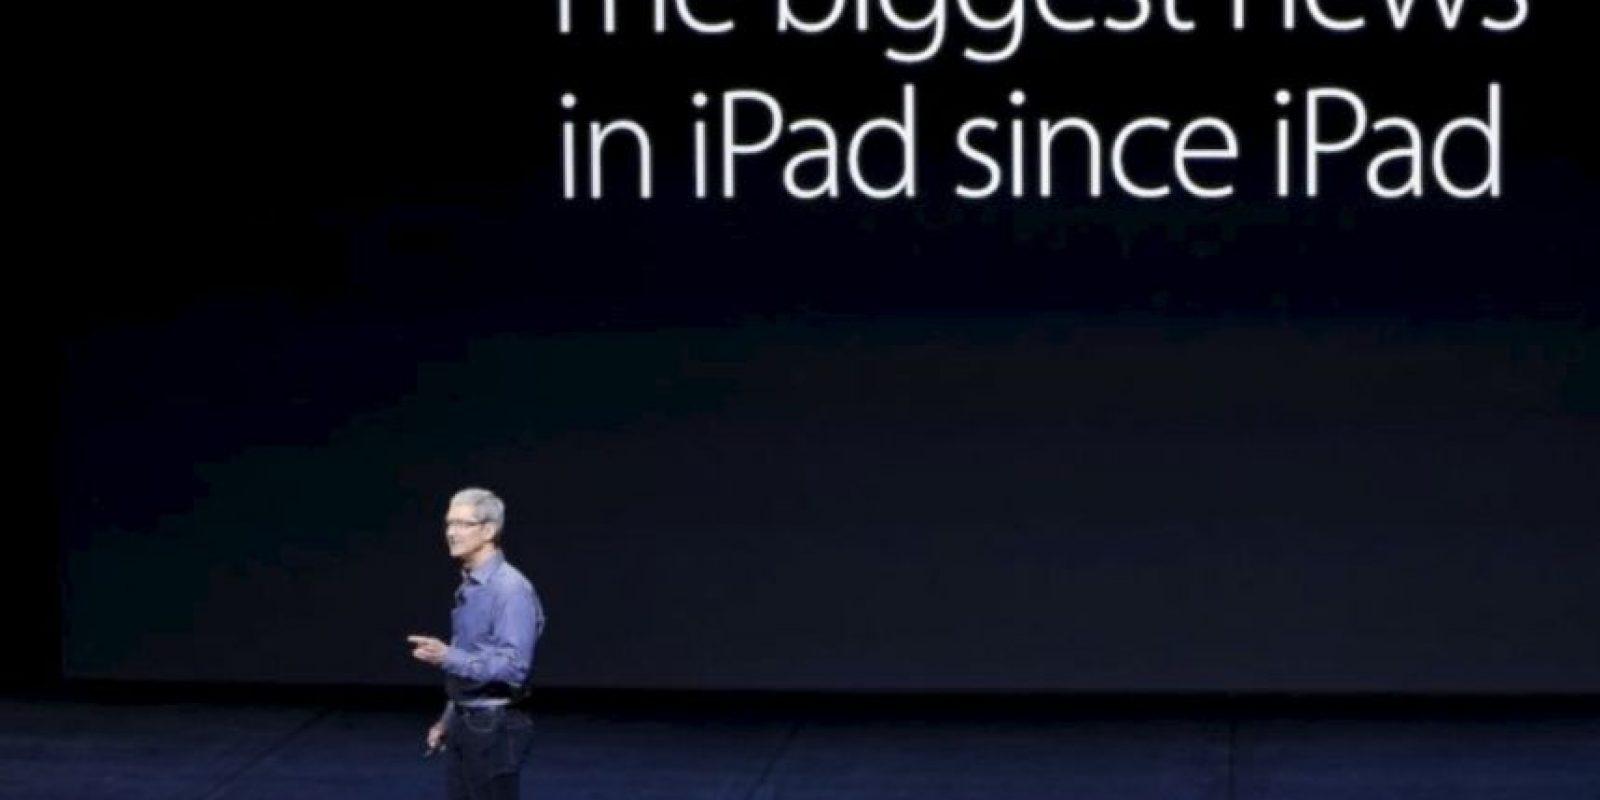 305.7 * 220.6 * 0.27 mm son sus dimensiones. Foto:Apple